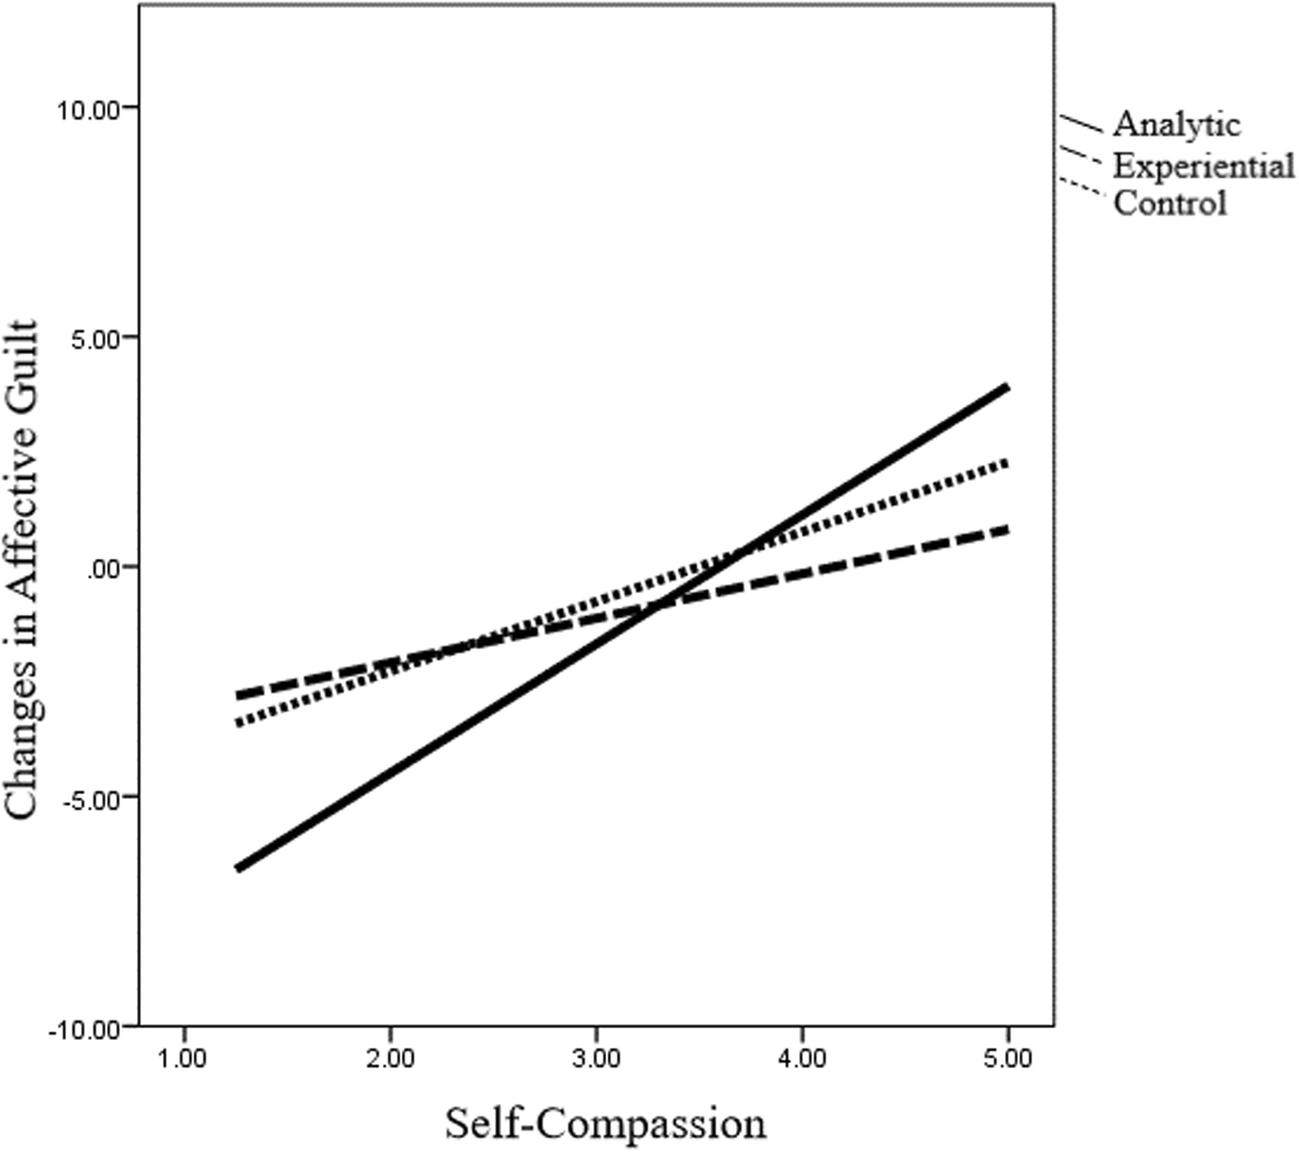 Modes of Processing Trauma: Self-Compassion Buffers